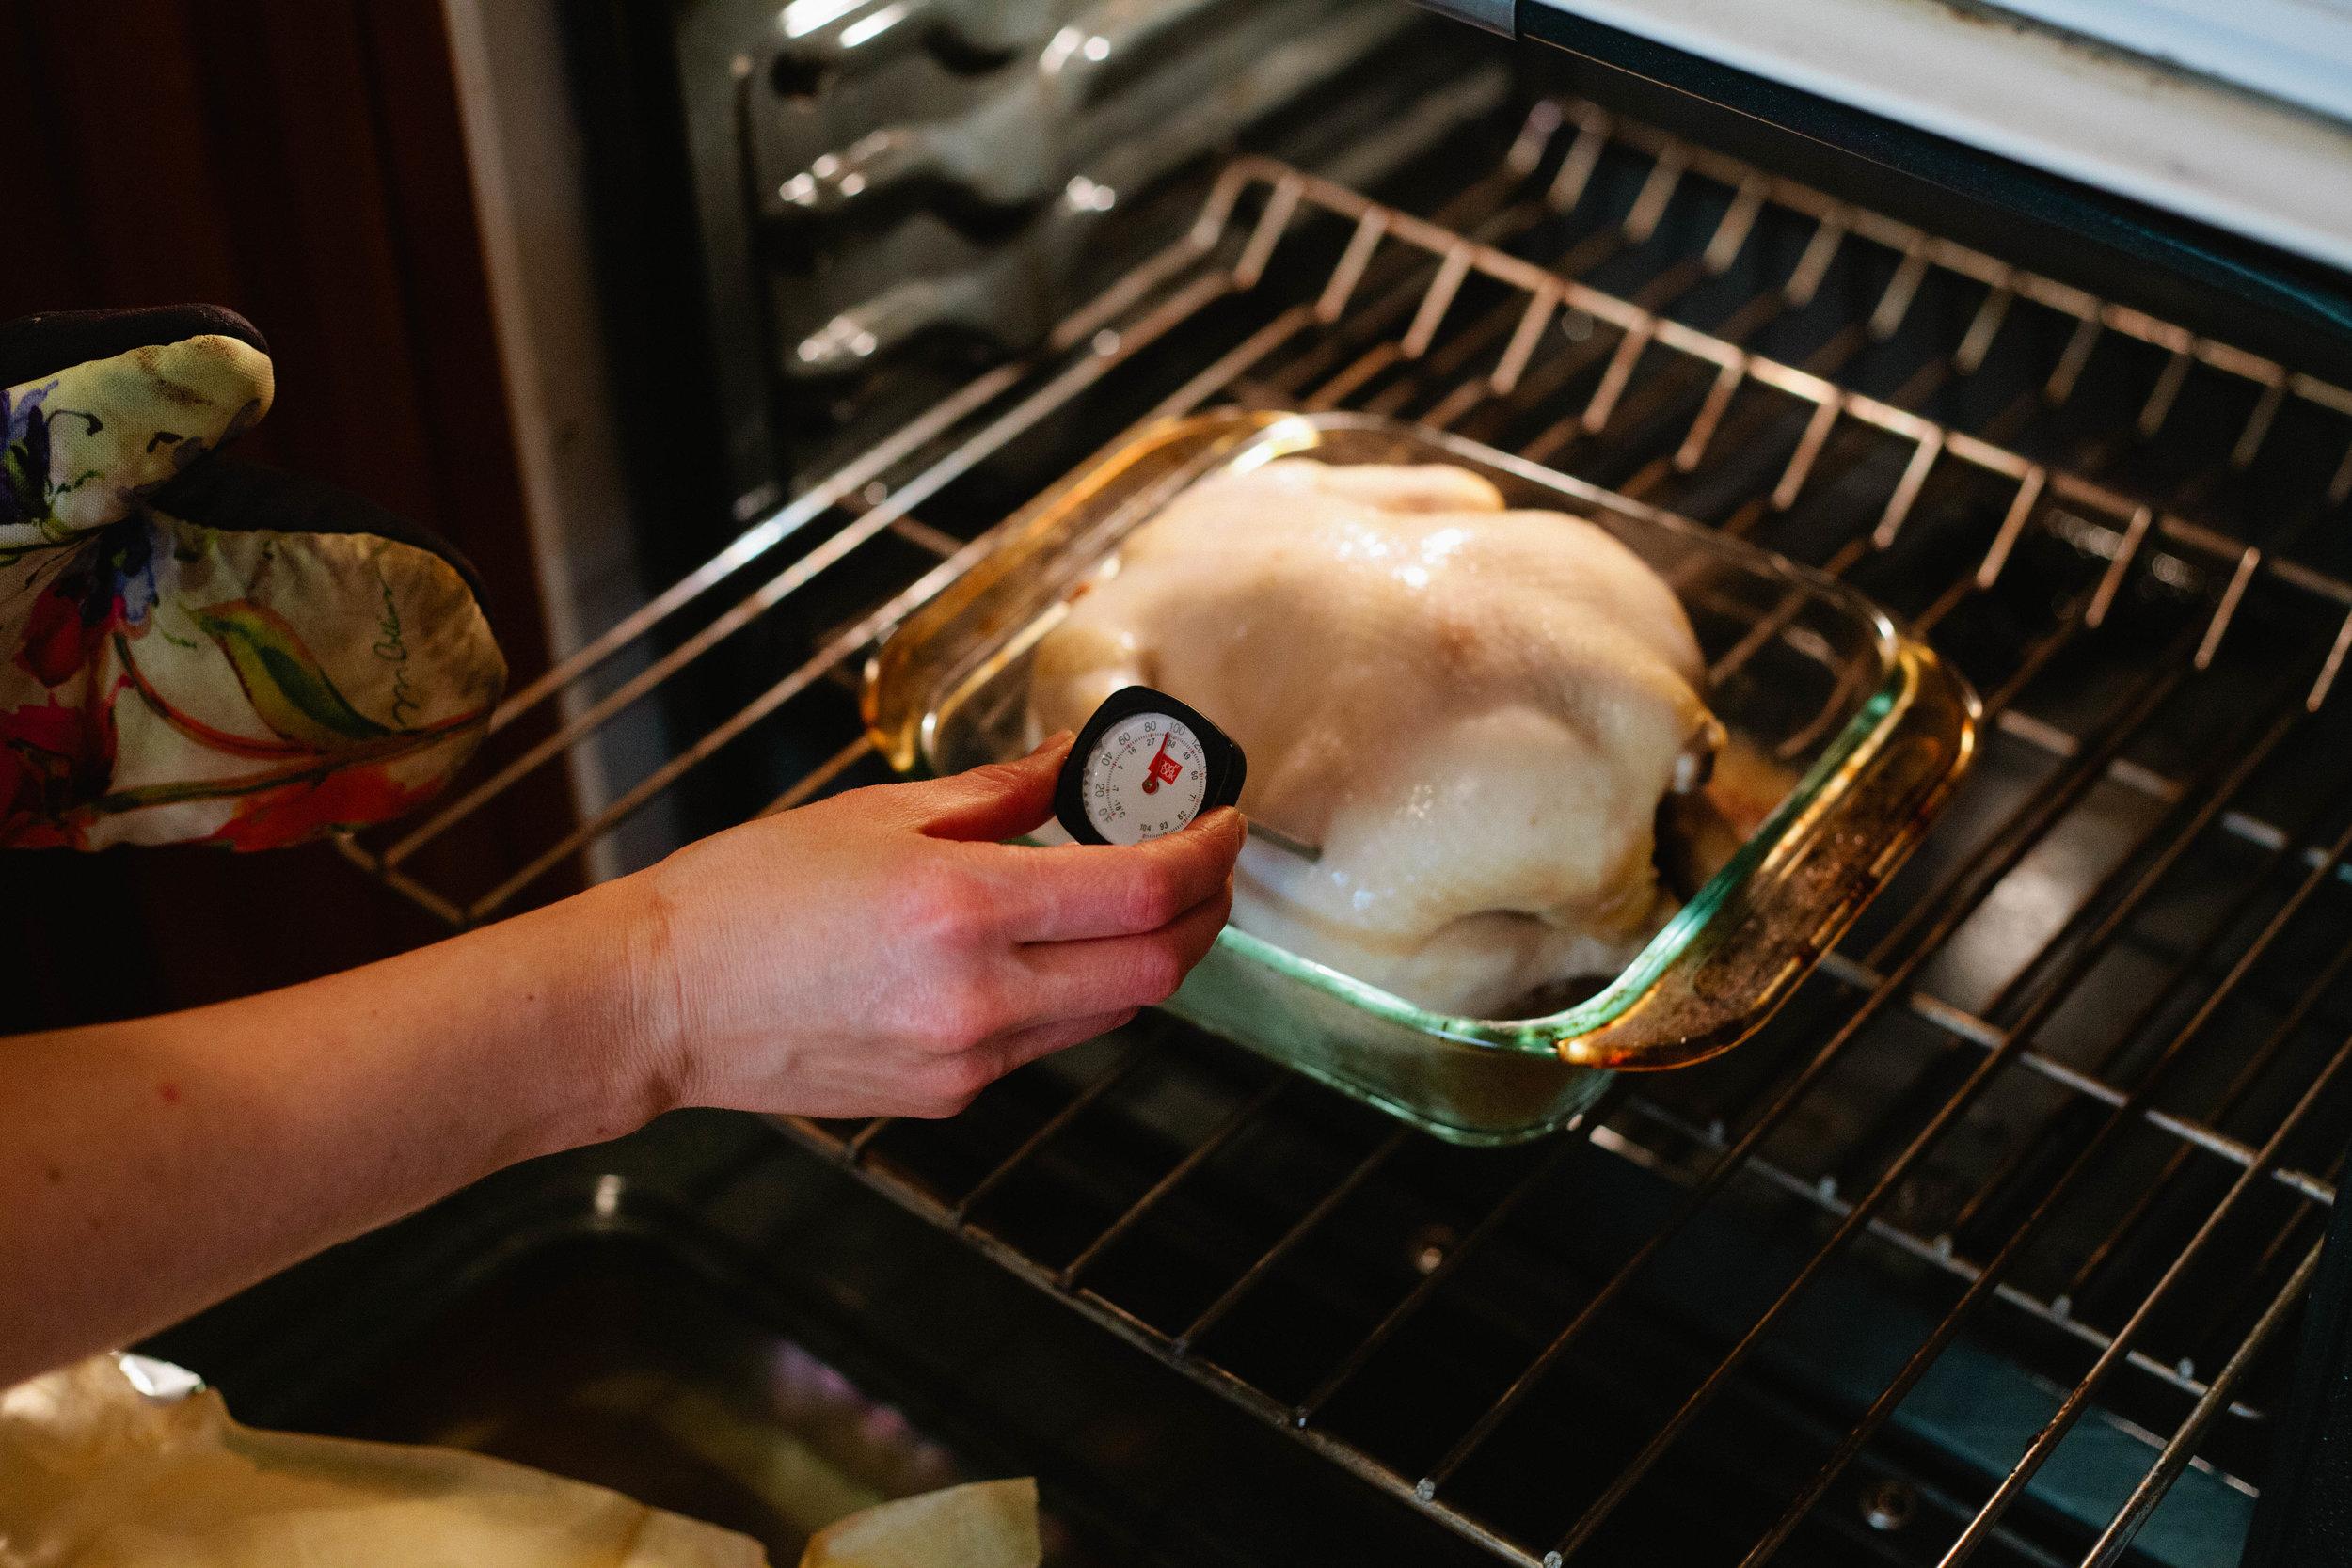 Simple-Roasted-Chicken-Recipe-Roast-Chicken-with-Salt-GAPS-Legal-How-To-Make-Chicken-On-GAPS-Whole-30-Chicken-Recipe